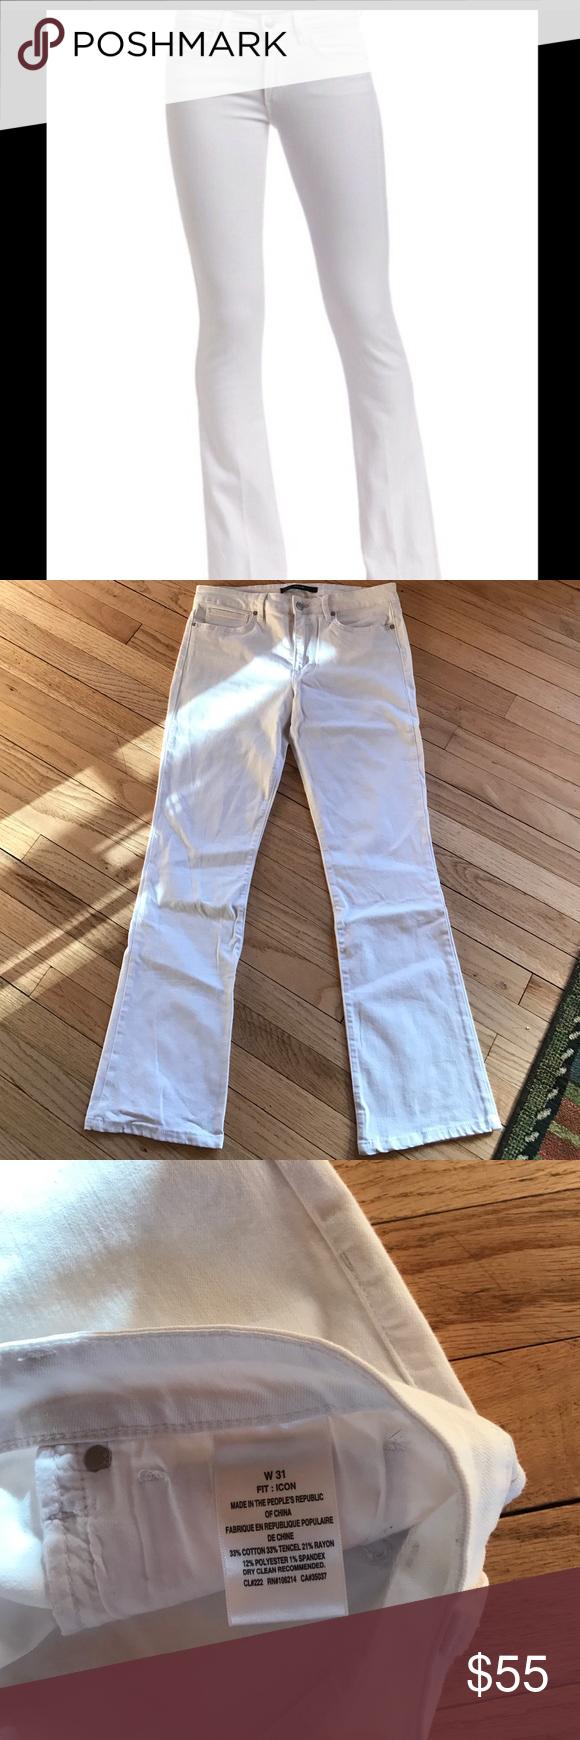 Joe's Icon bootcut jeans in white. Size 31 Worn 1-2 times. Great, flattering fit. Inseam 30 Joe's Jeans Jeans Boot Cut